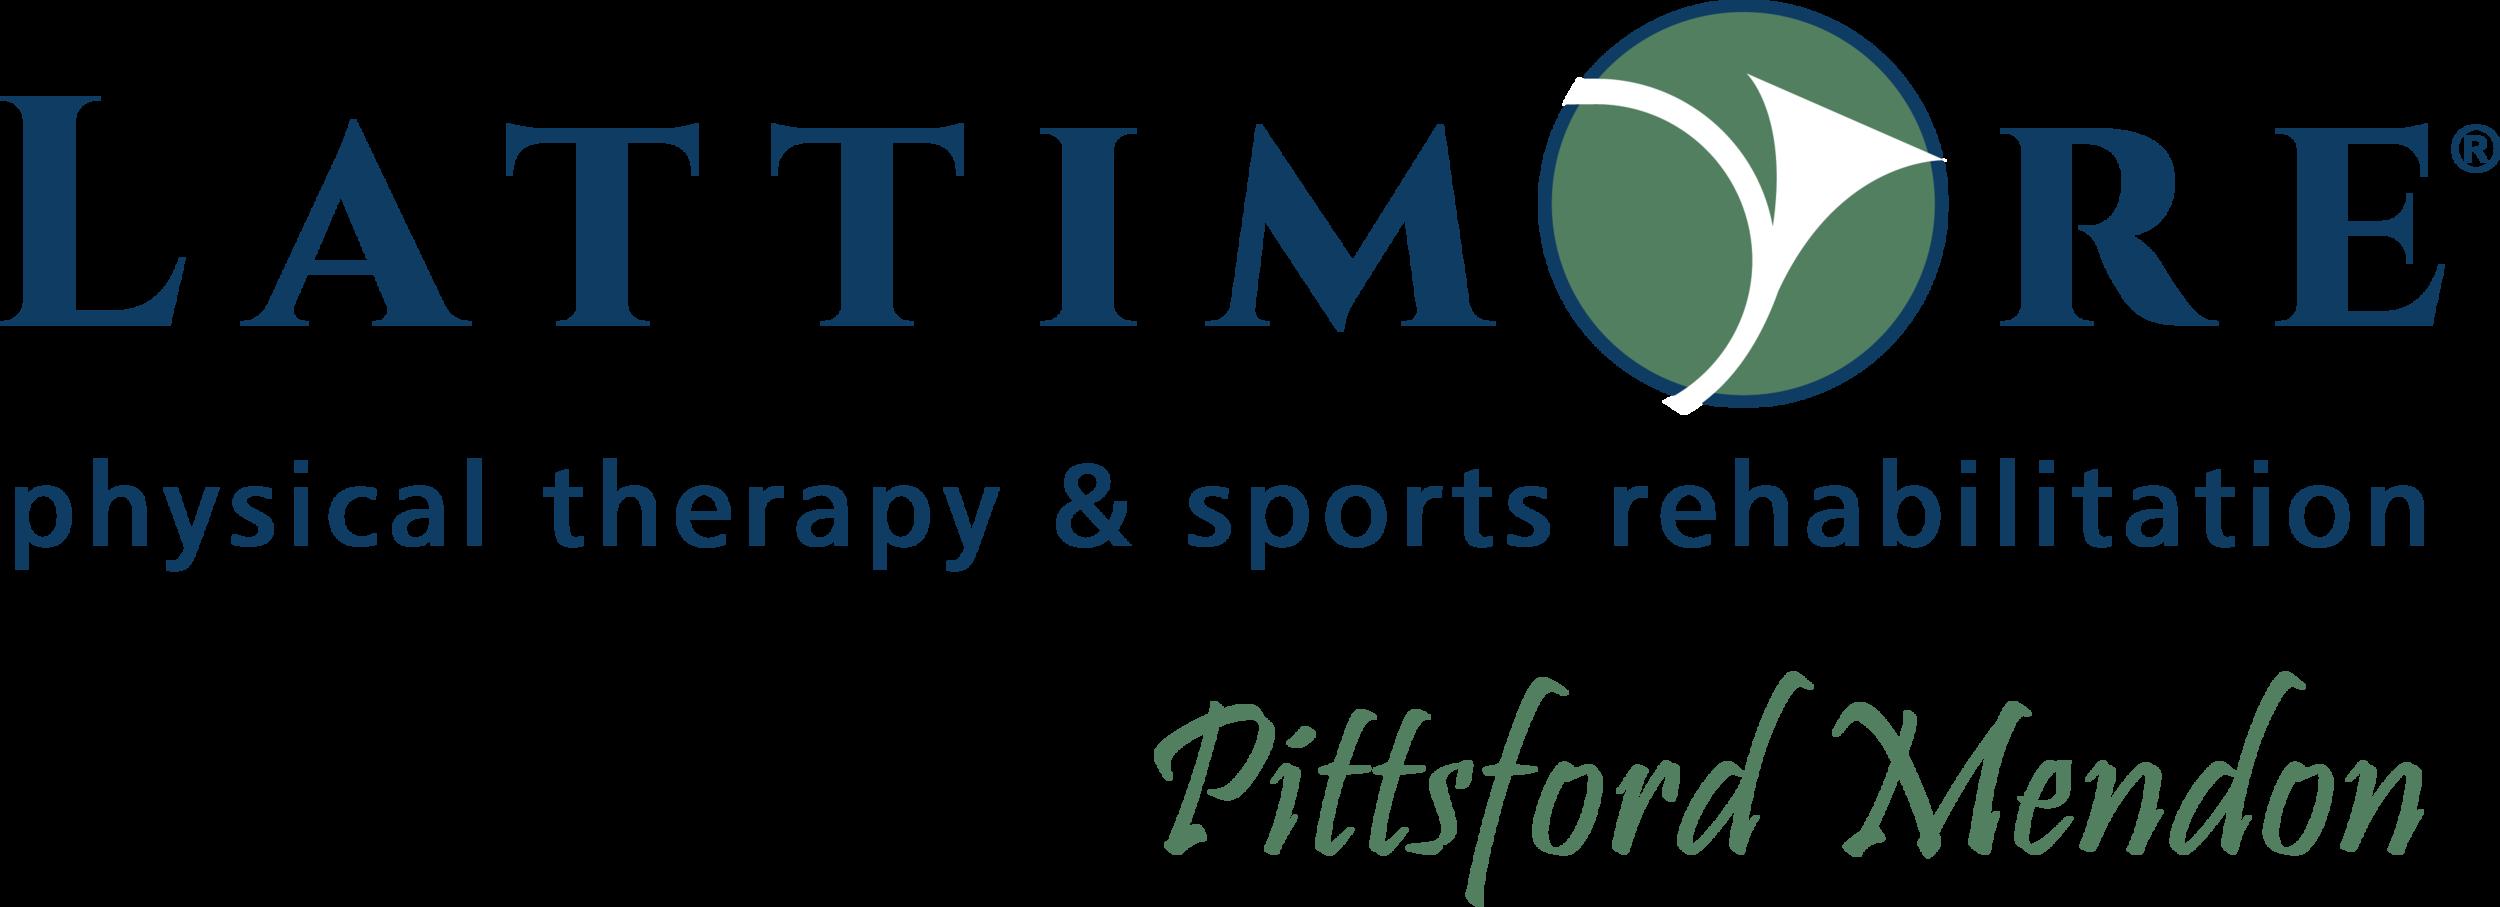 2019-05_Lattimore-Logo-PittsfordMendon.png